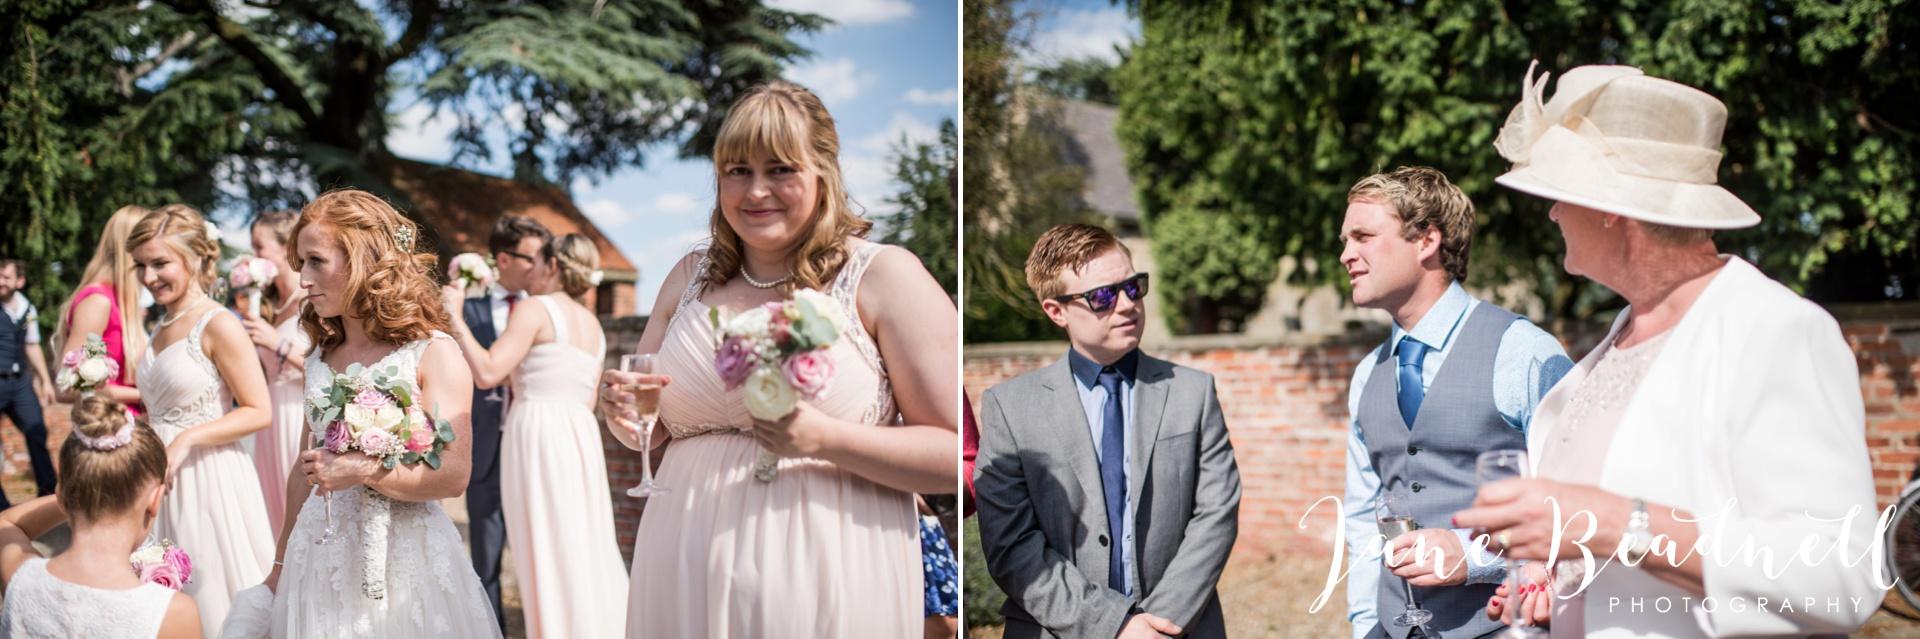 yorkshire-fine-art-wedding-photographer-jane-beadnell-photography-poppleton-york_0072